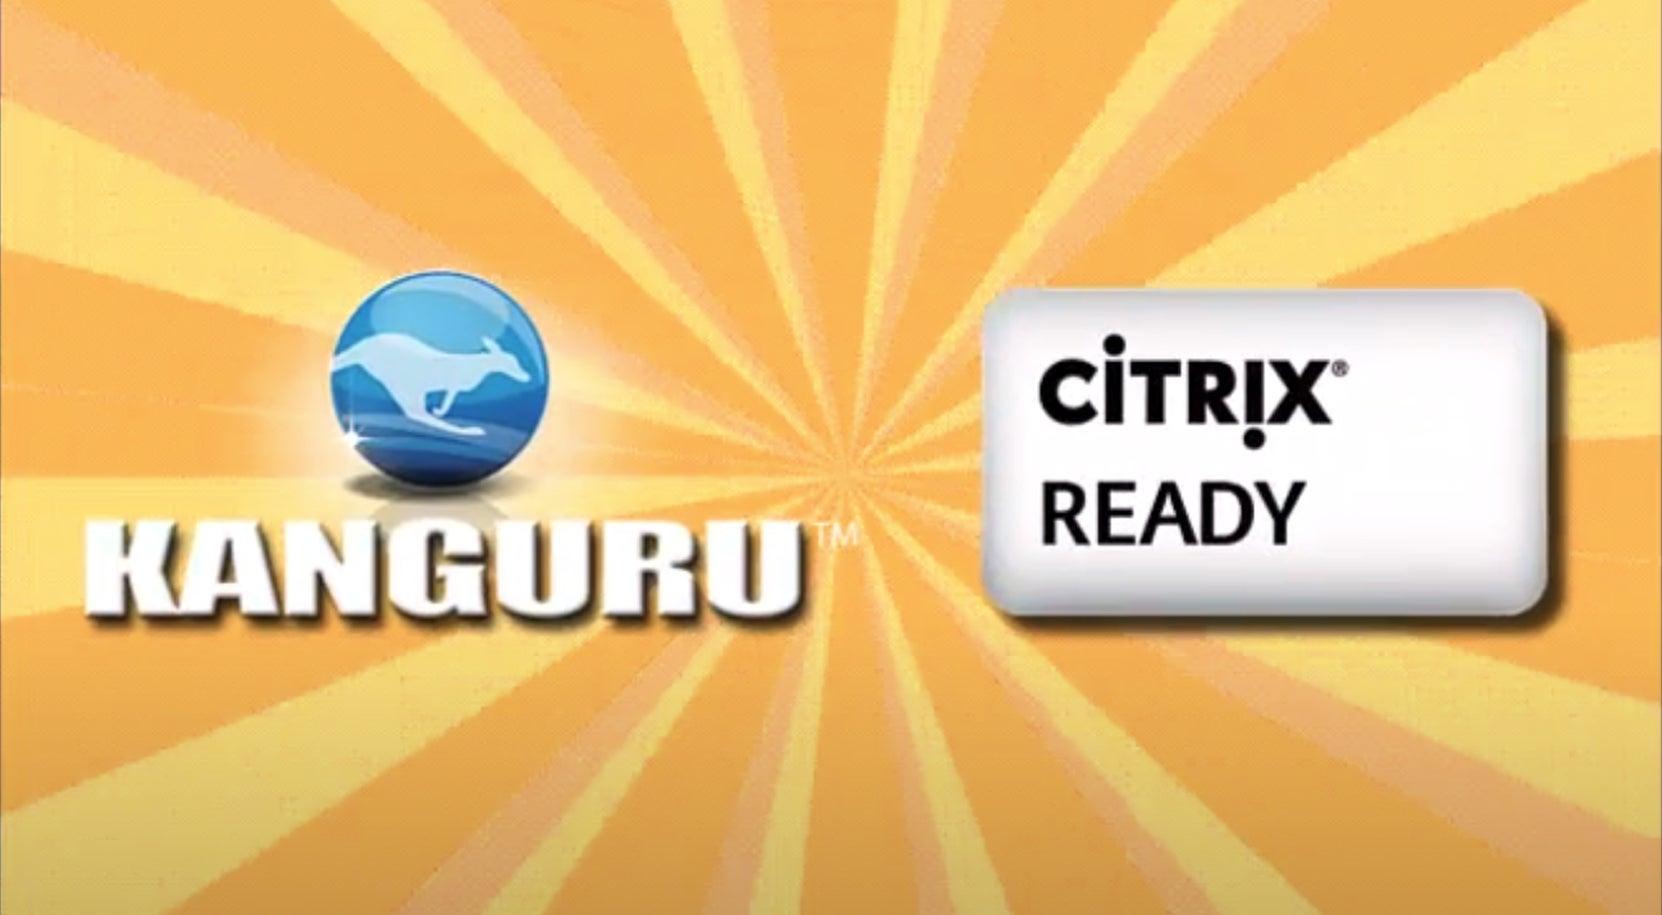 4. Kanguru Defender Secure Drives with Citrix-Ready XenDesktop Access